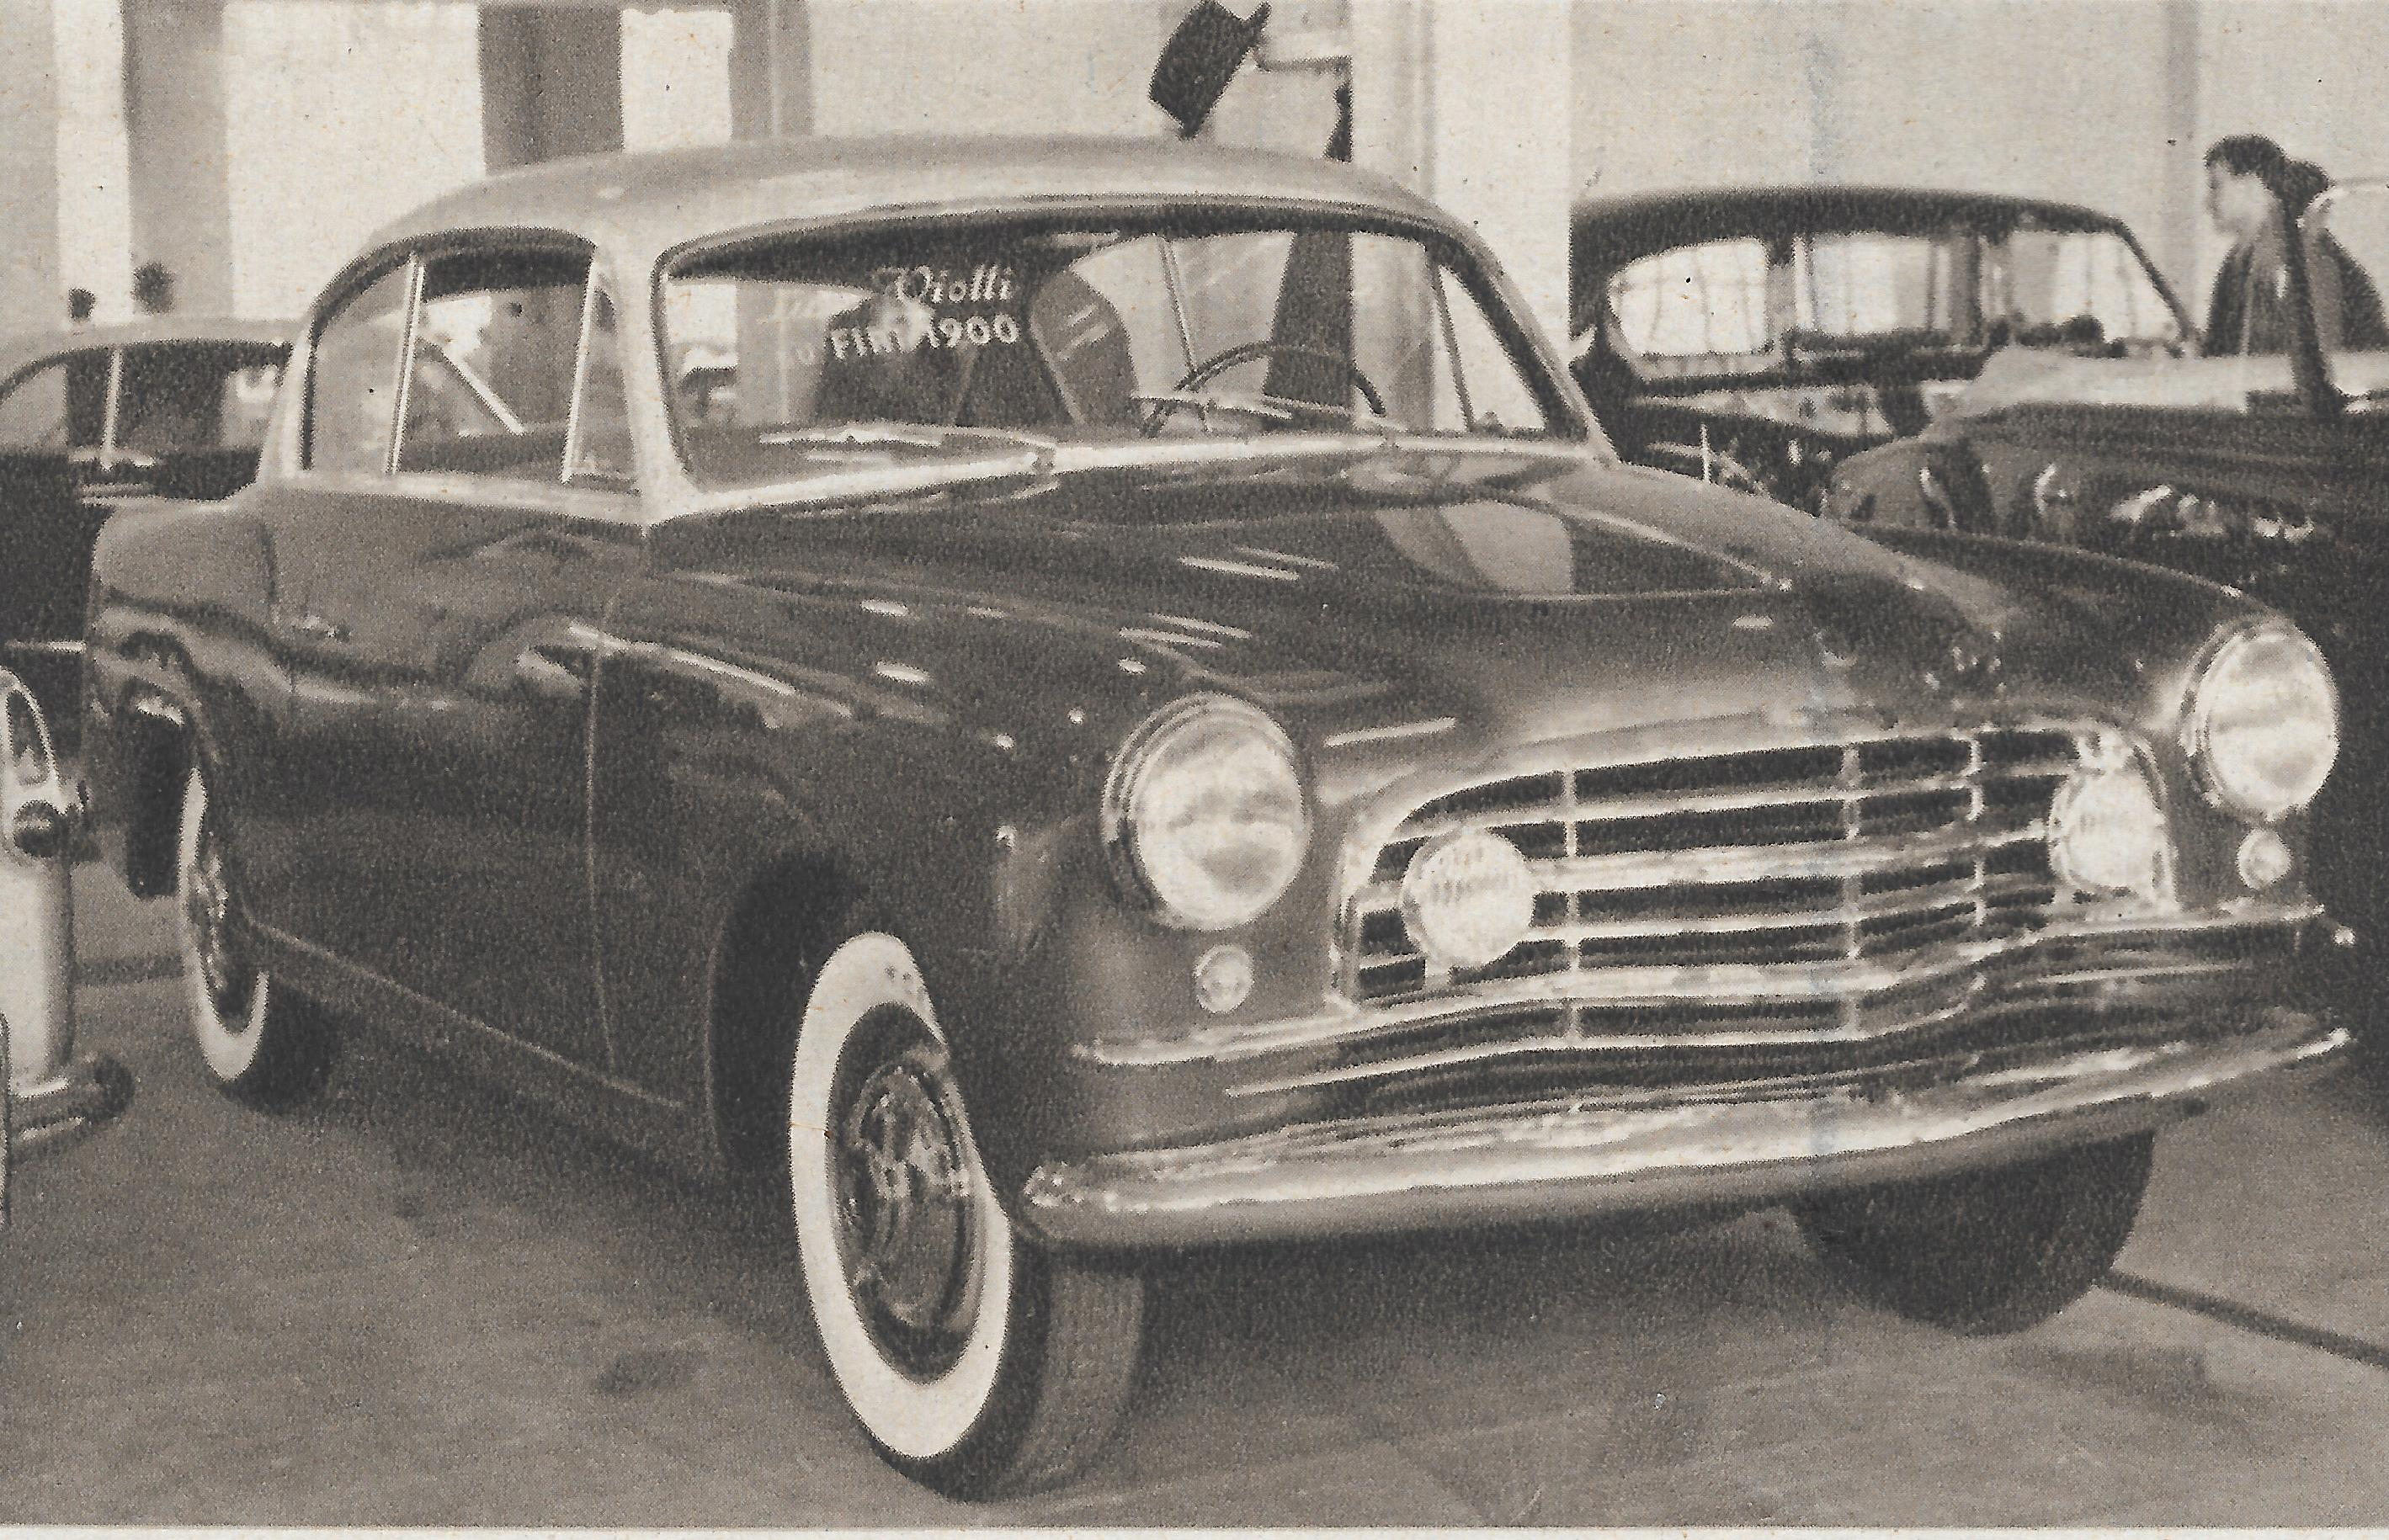 Fiat-1900-built-by-Viott-1953